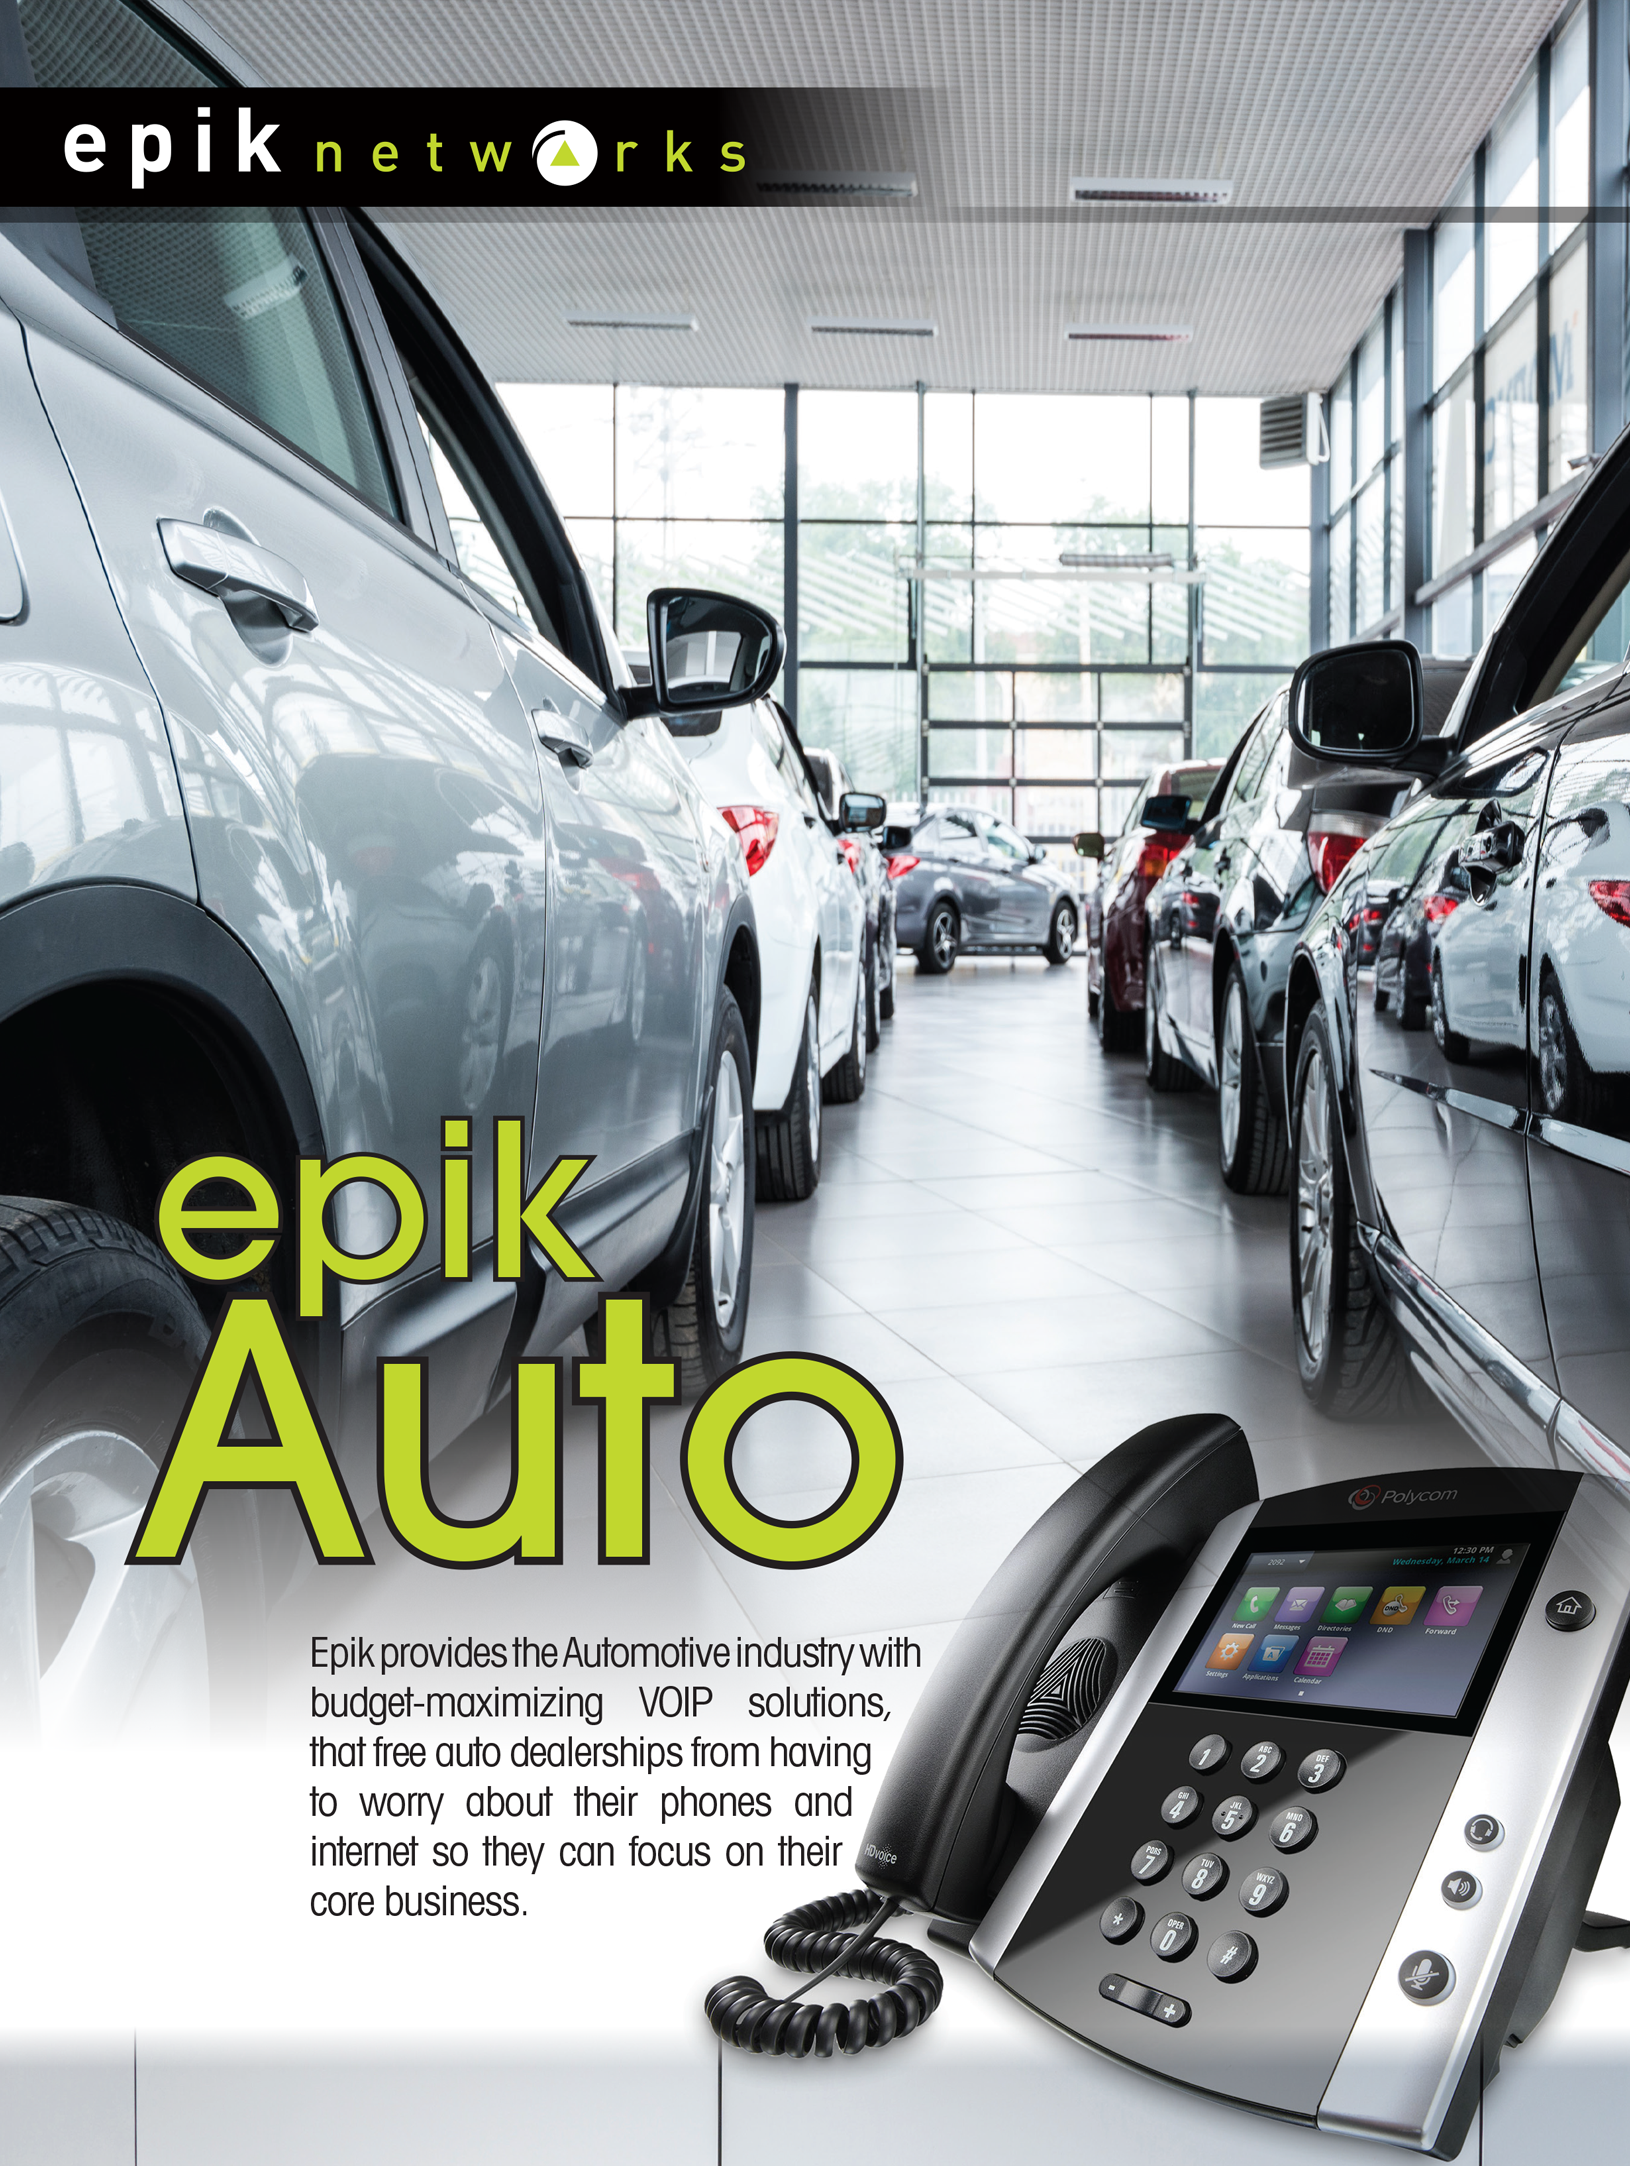 Epik Networks auto industry promotion